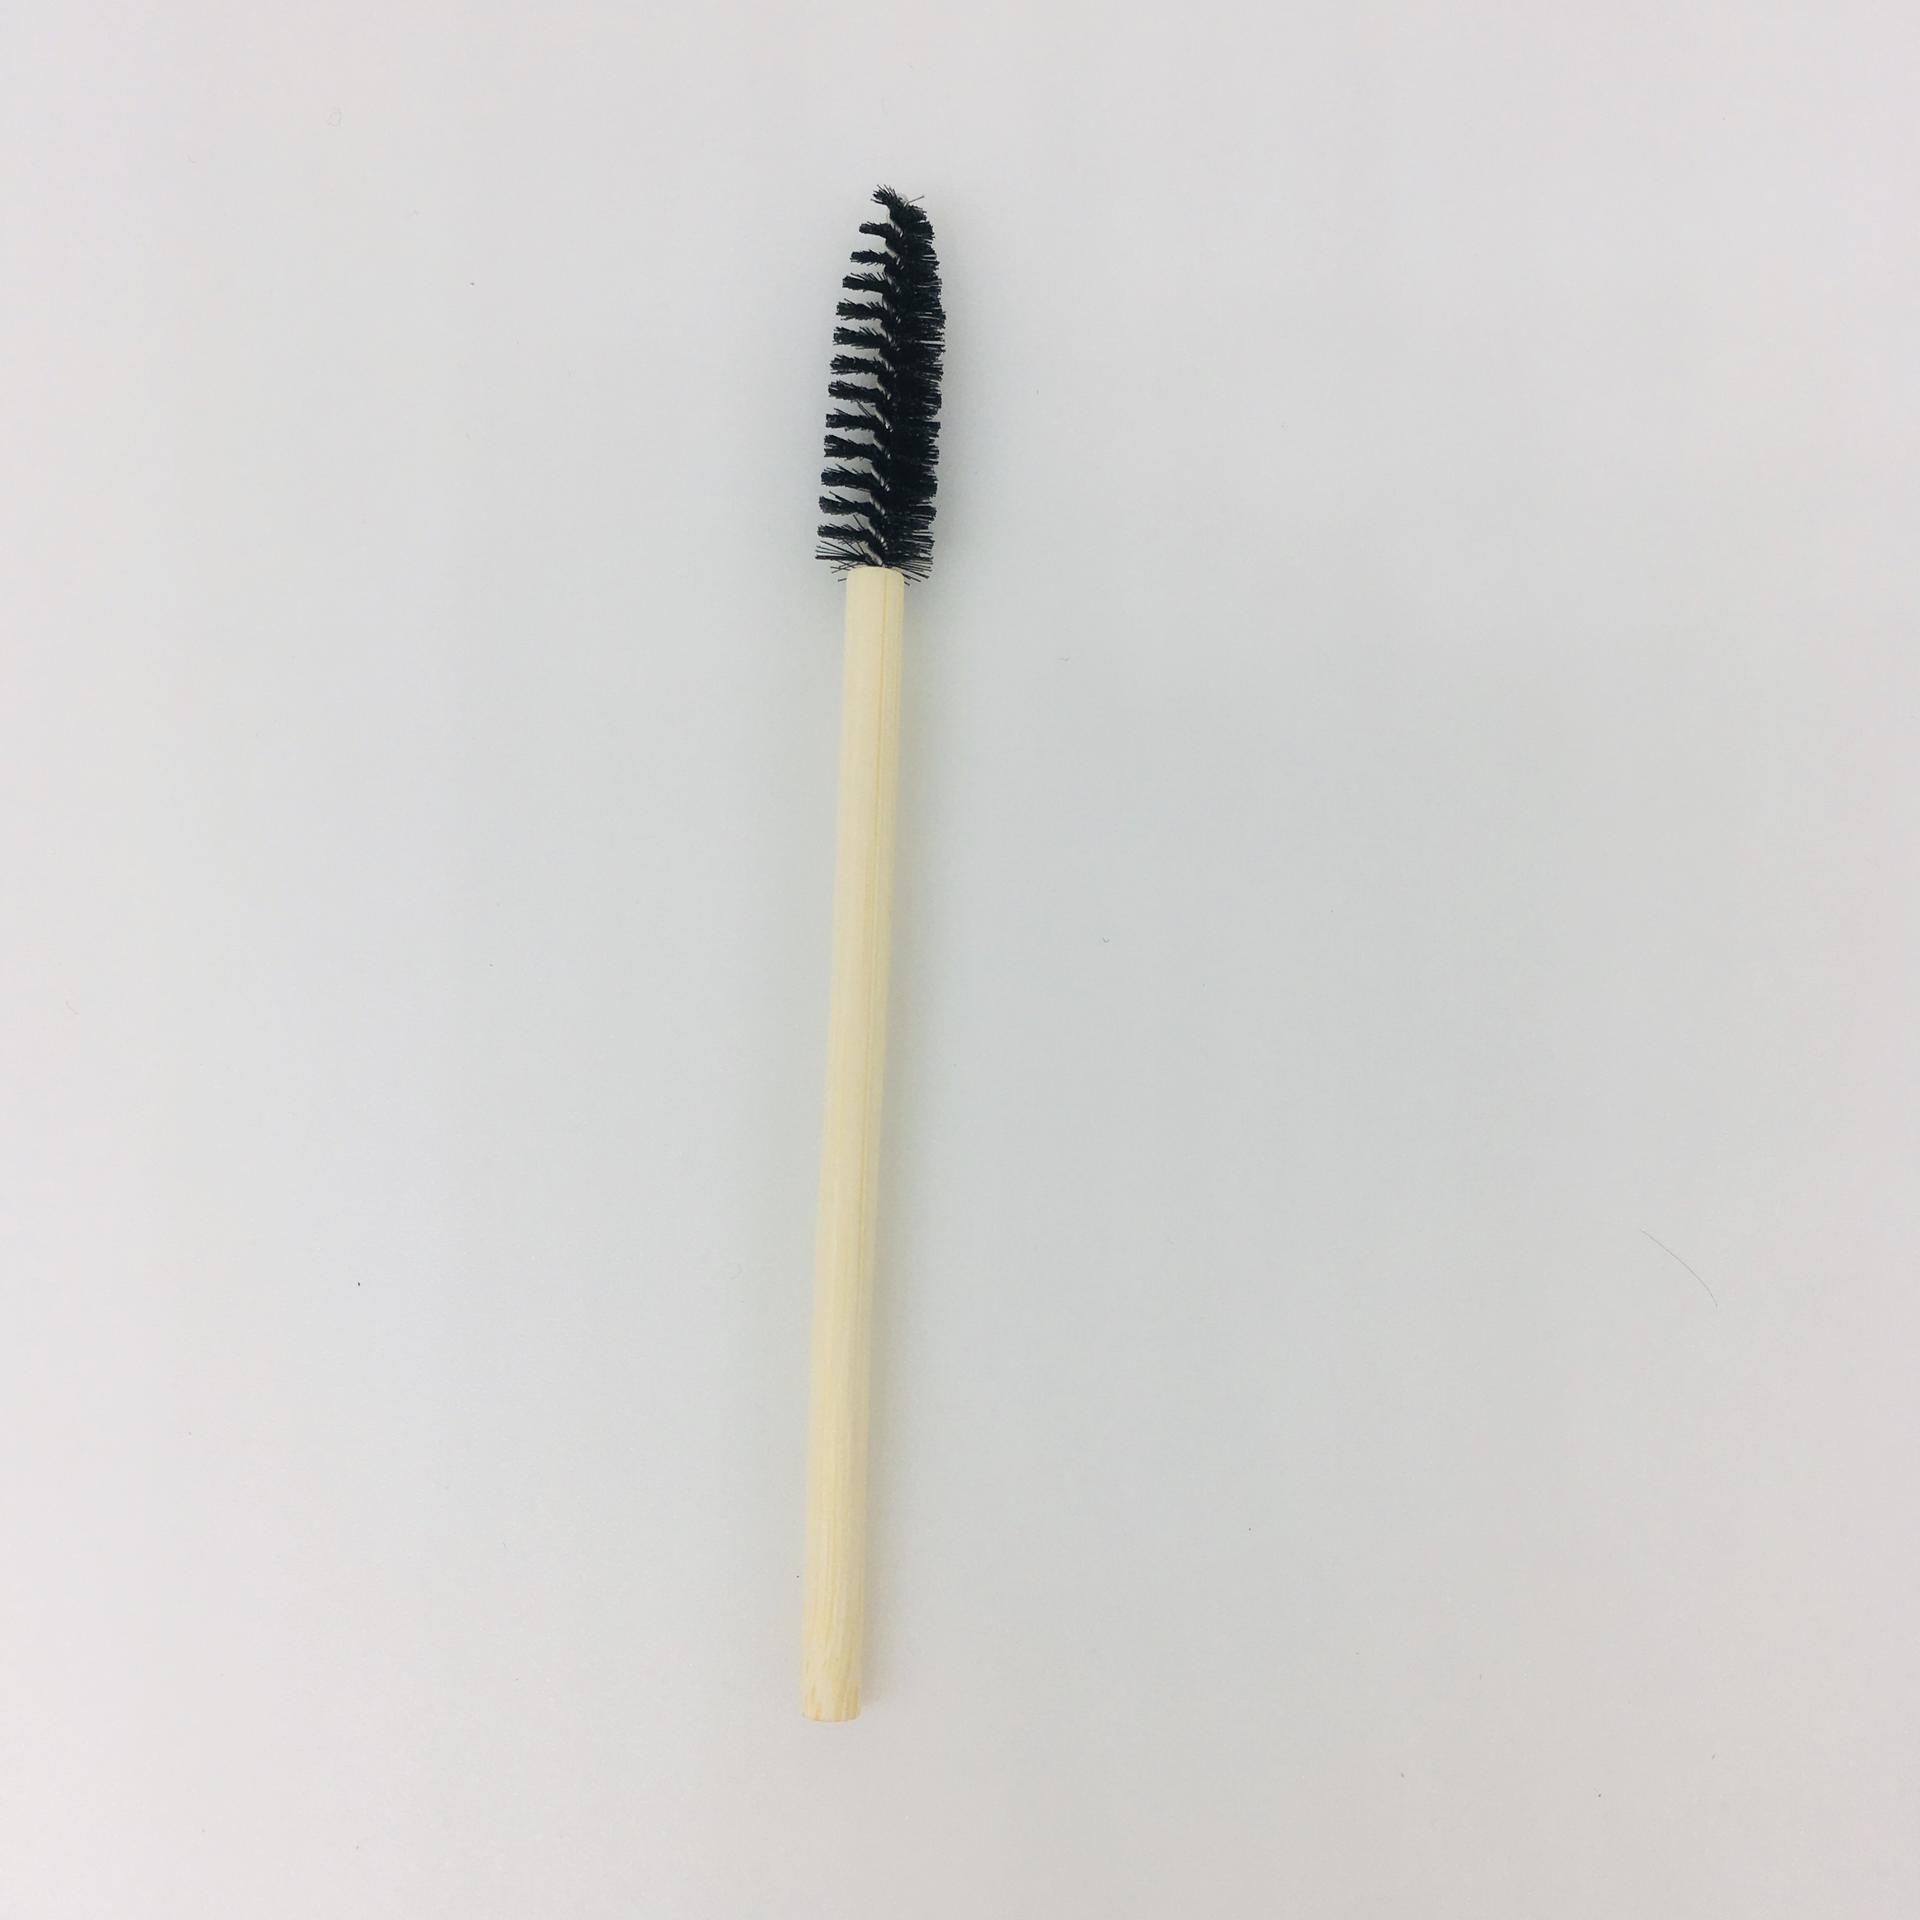 Eco-friendly bamboo mascara wand